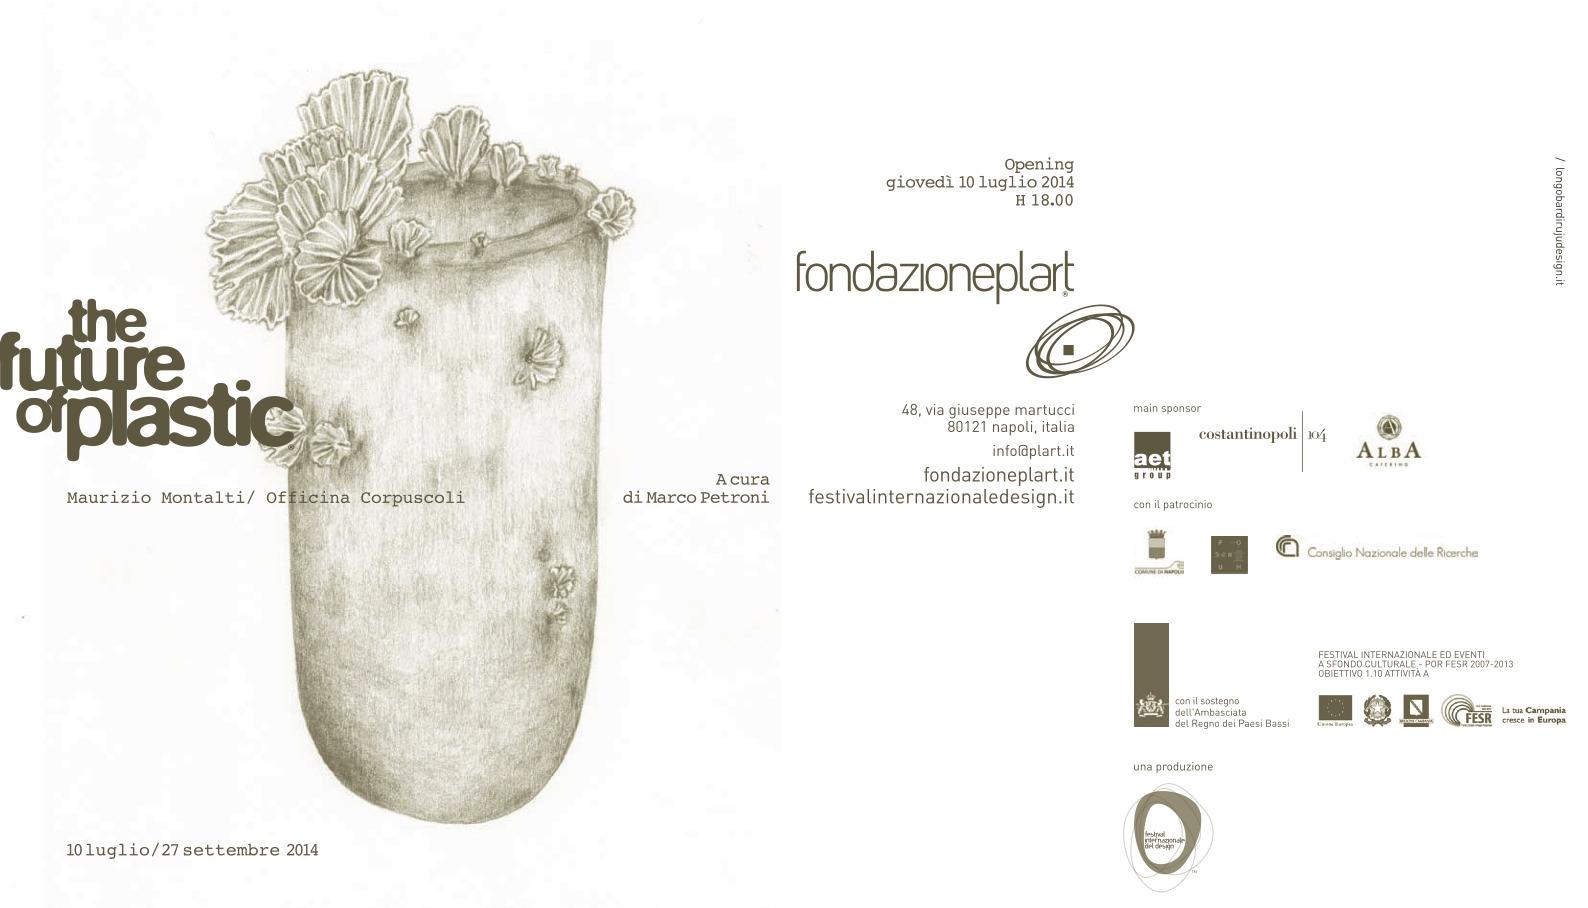 invitation opening - The Future of Plastic - Officina Corpuscoli_Maurizio Montalti @PLART